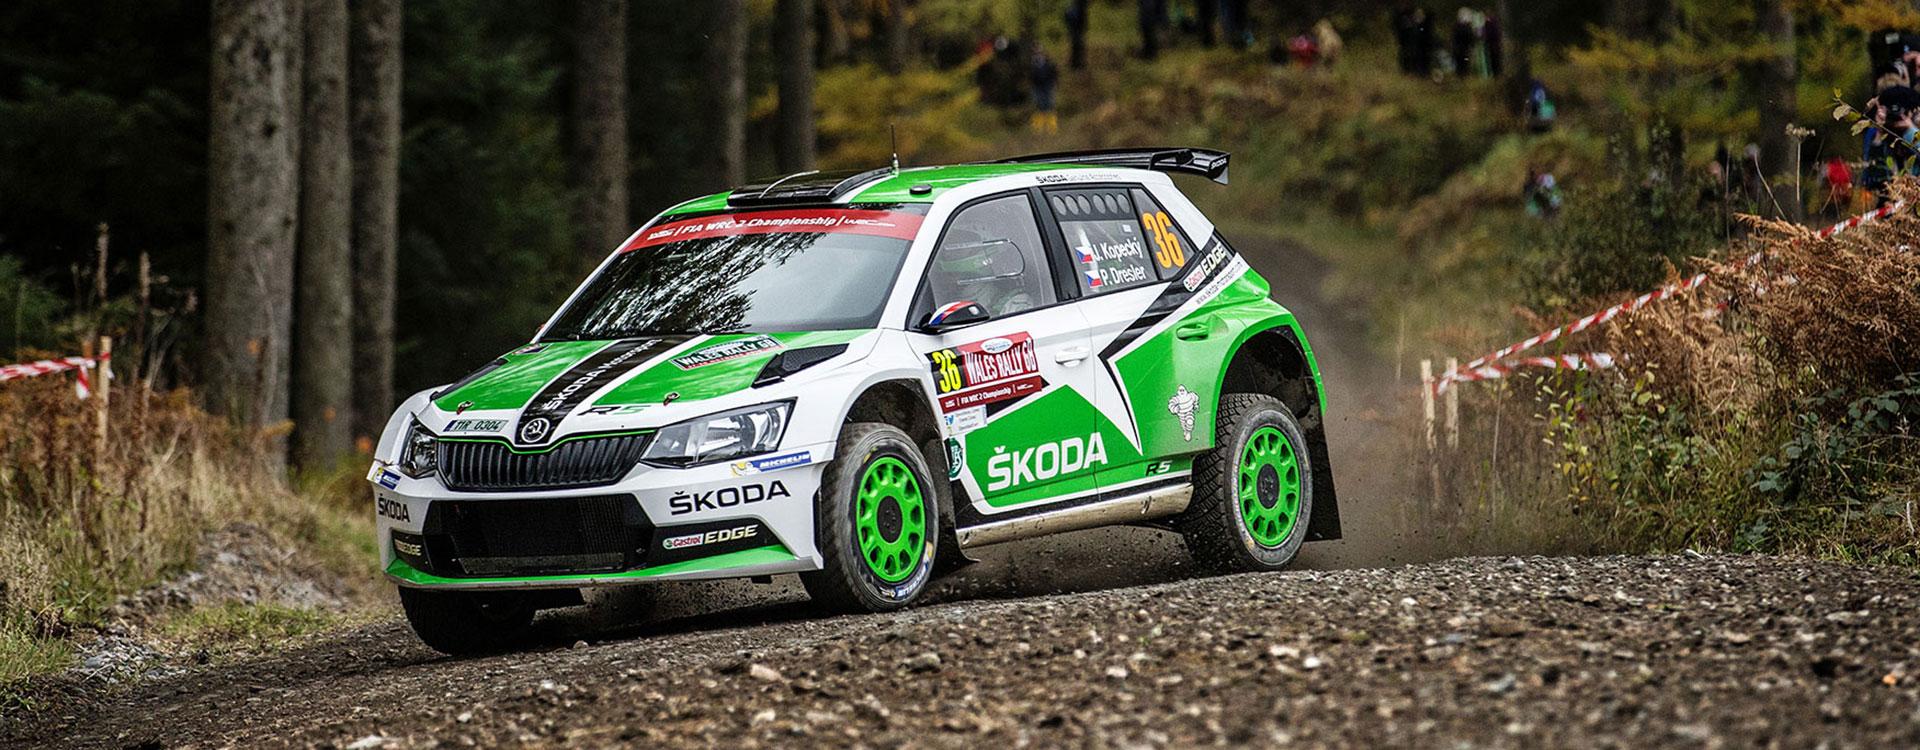 FOTO: ŠKODA Motorsport na Britské rally 2016